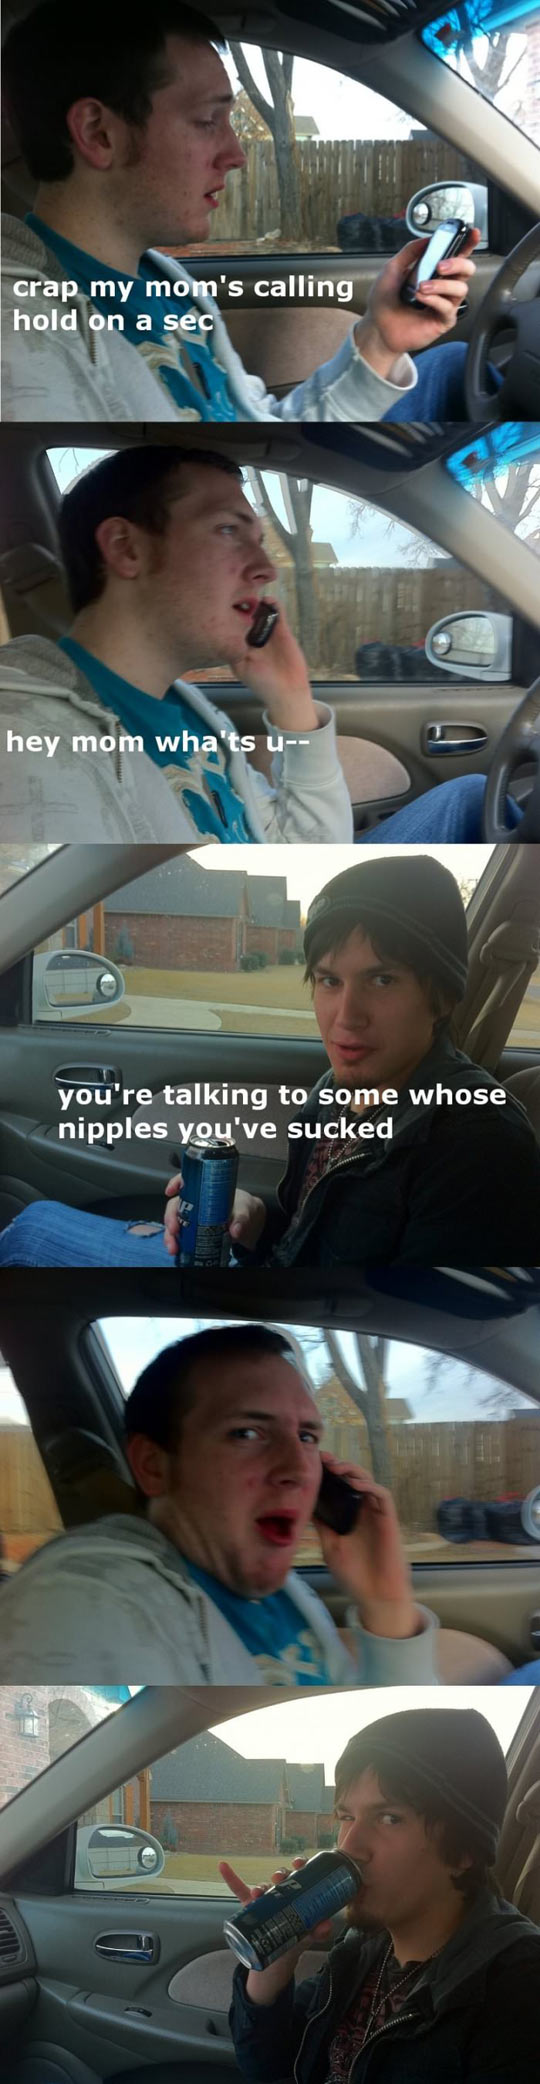 funny-car-phone-friends-mom